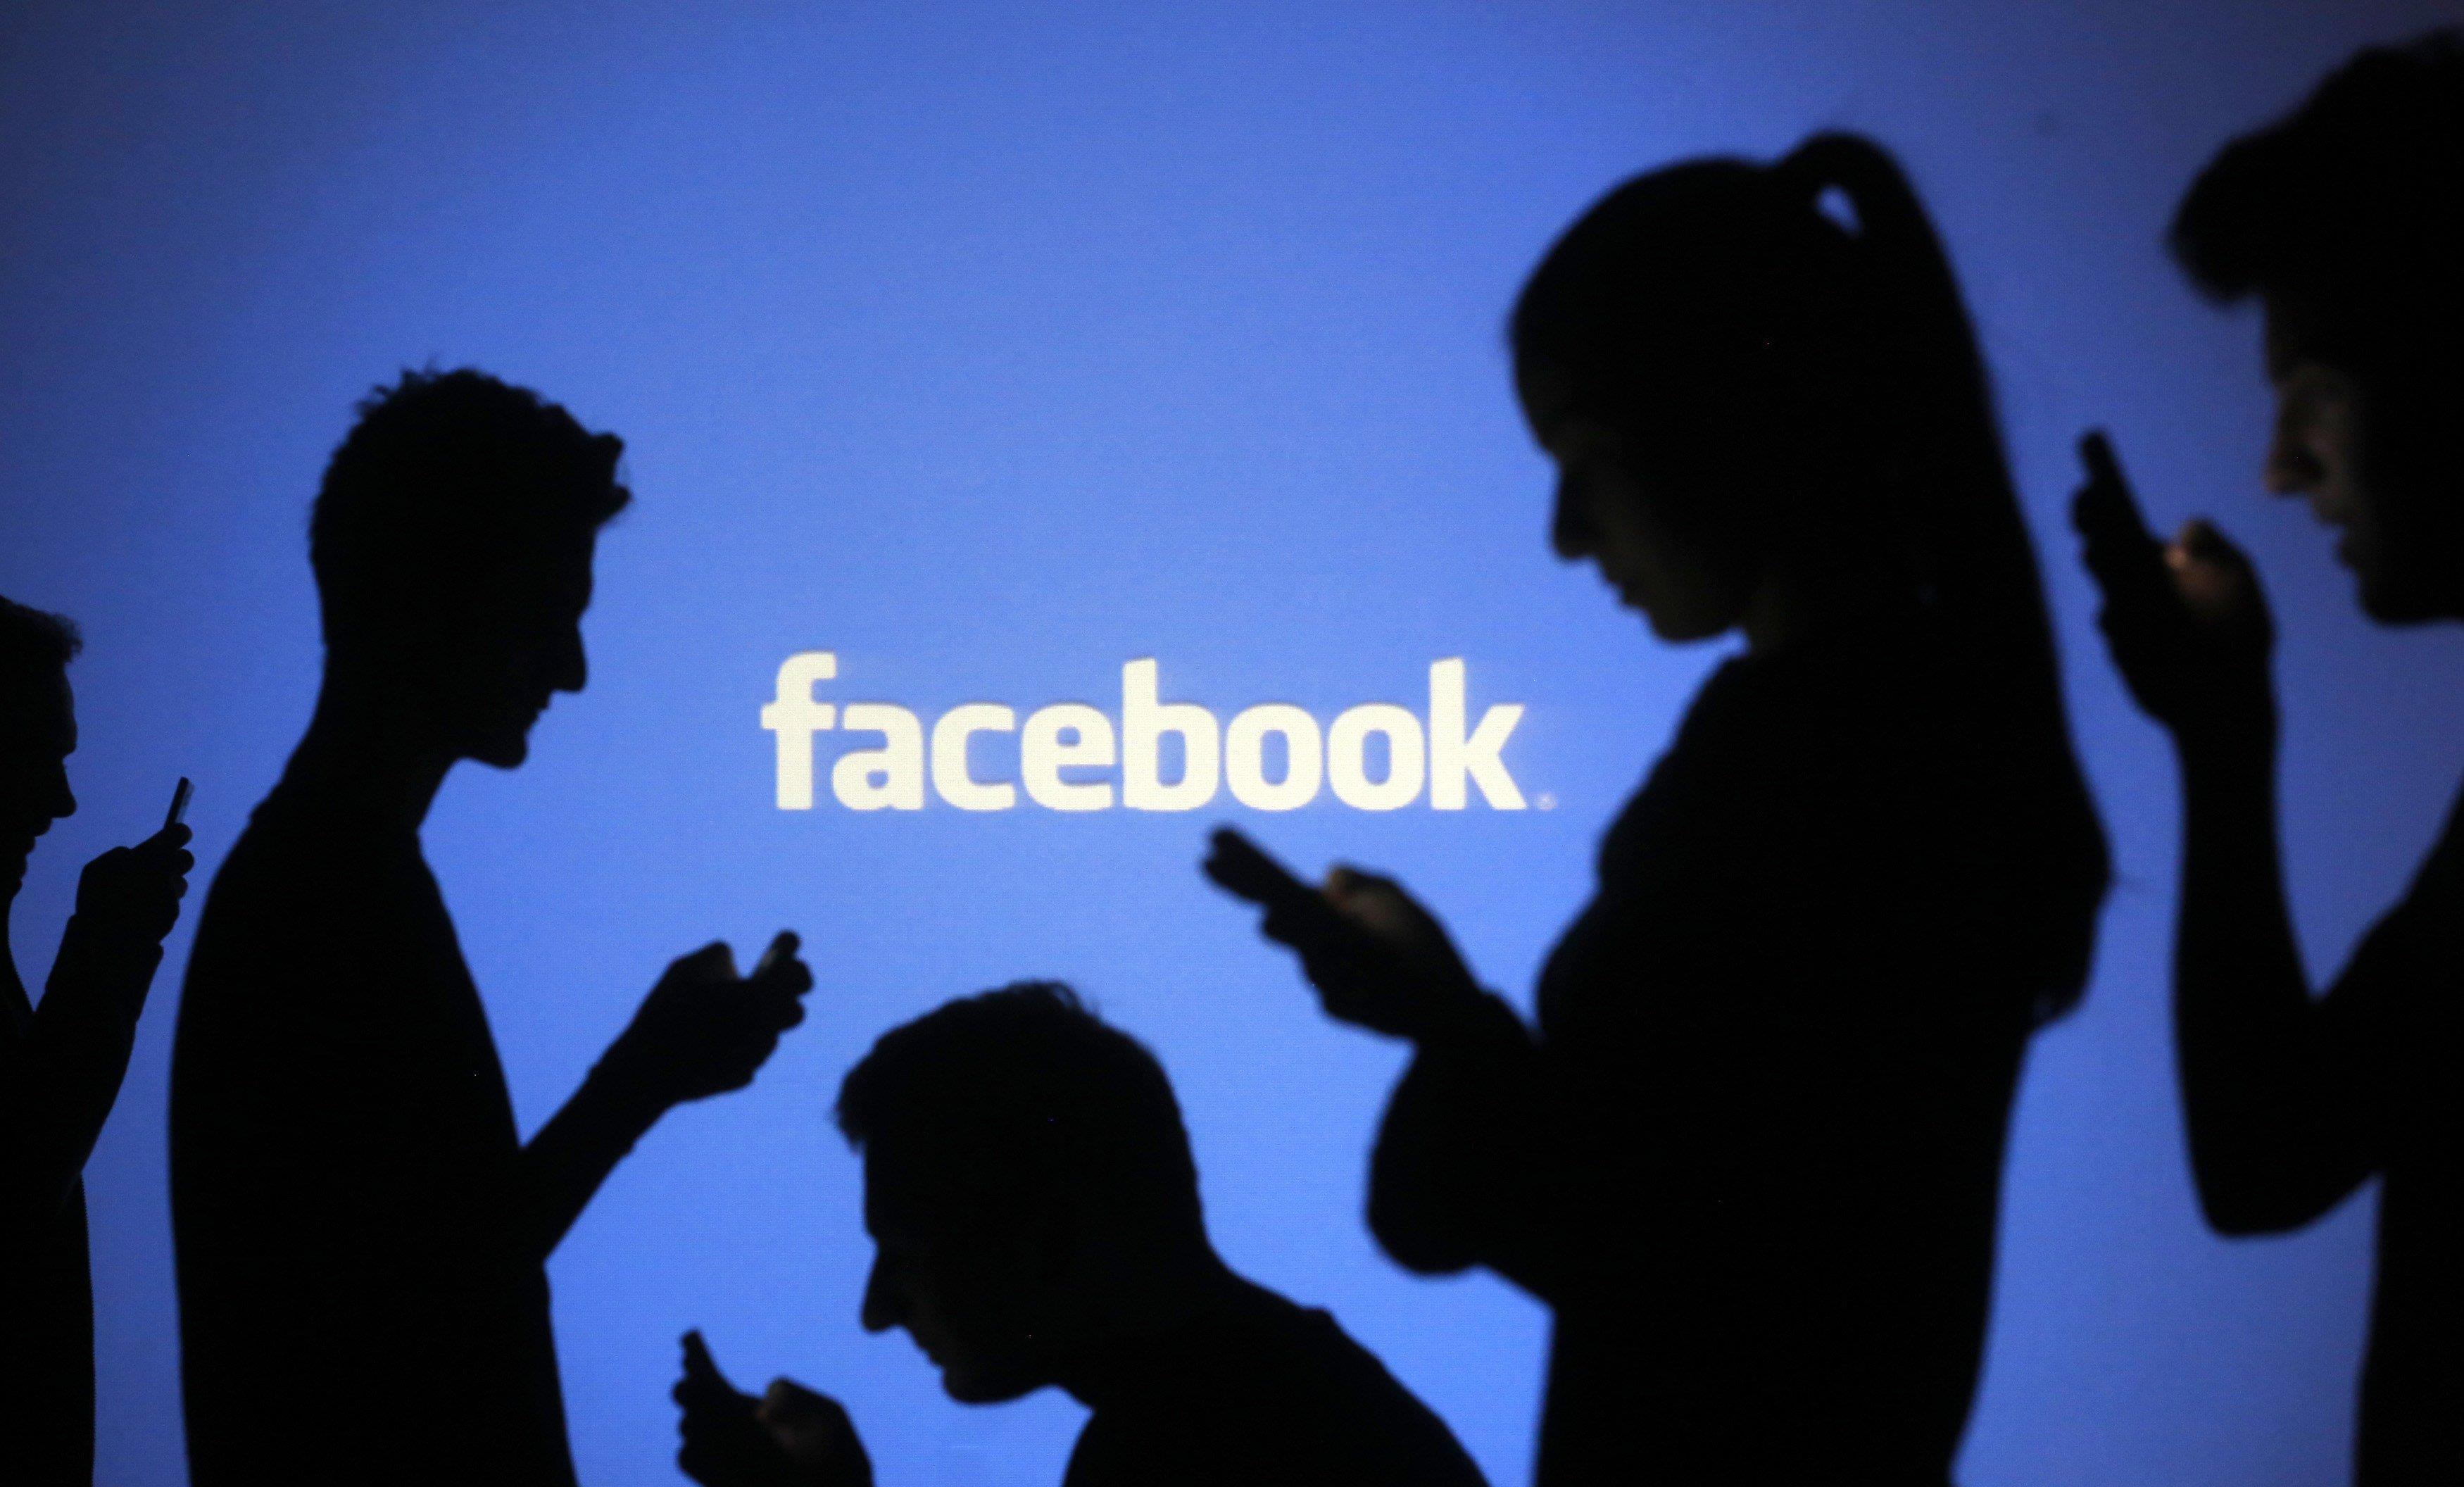 interesnye-fakty-o-socialnoj-seti-facebook